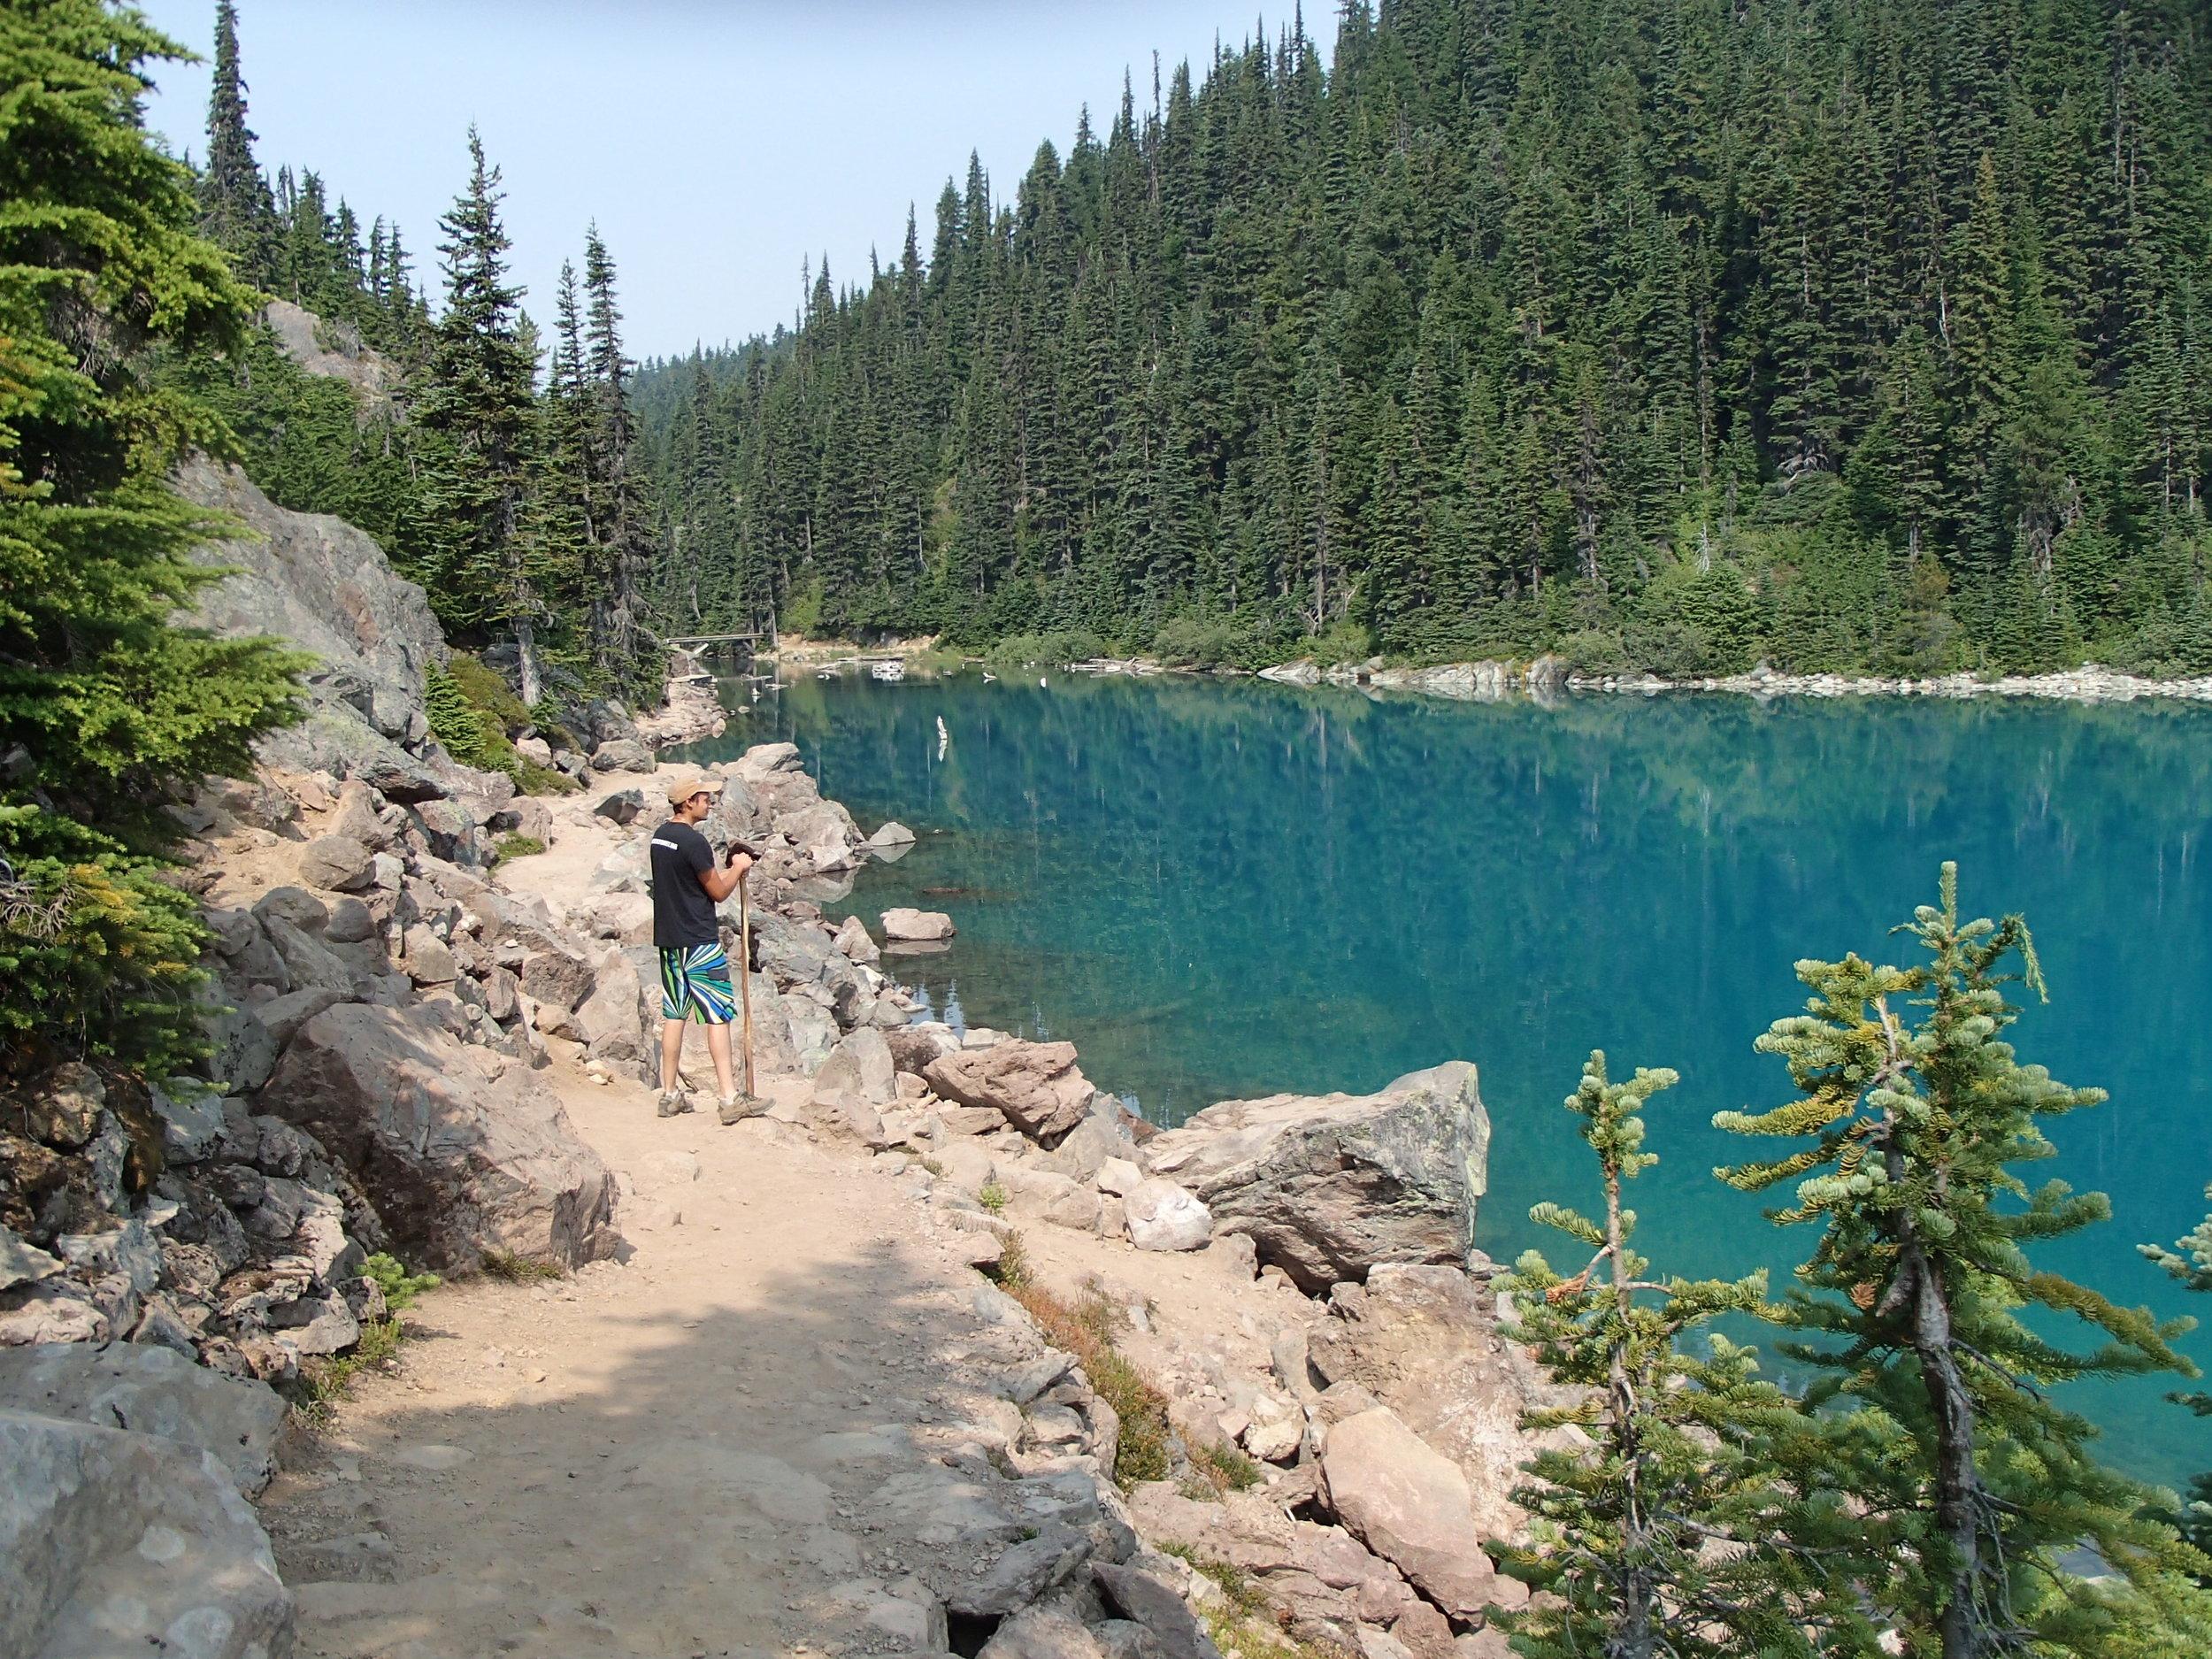 Garibaldi Provincial Park, British Columbia, Canada (photo credit: Nick Luymes)